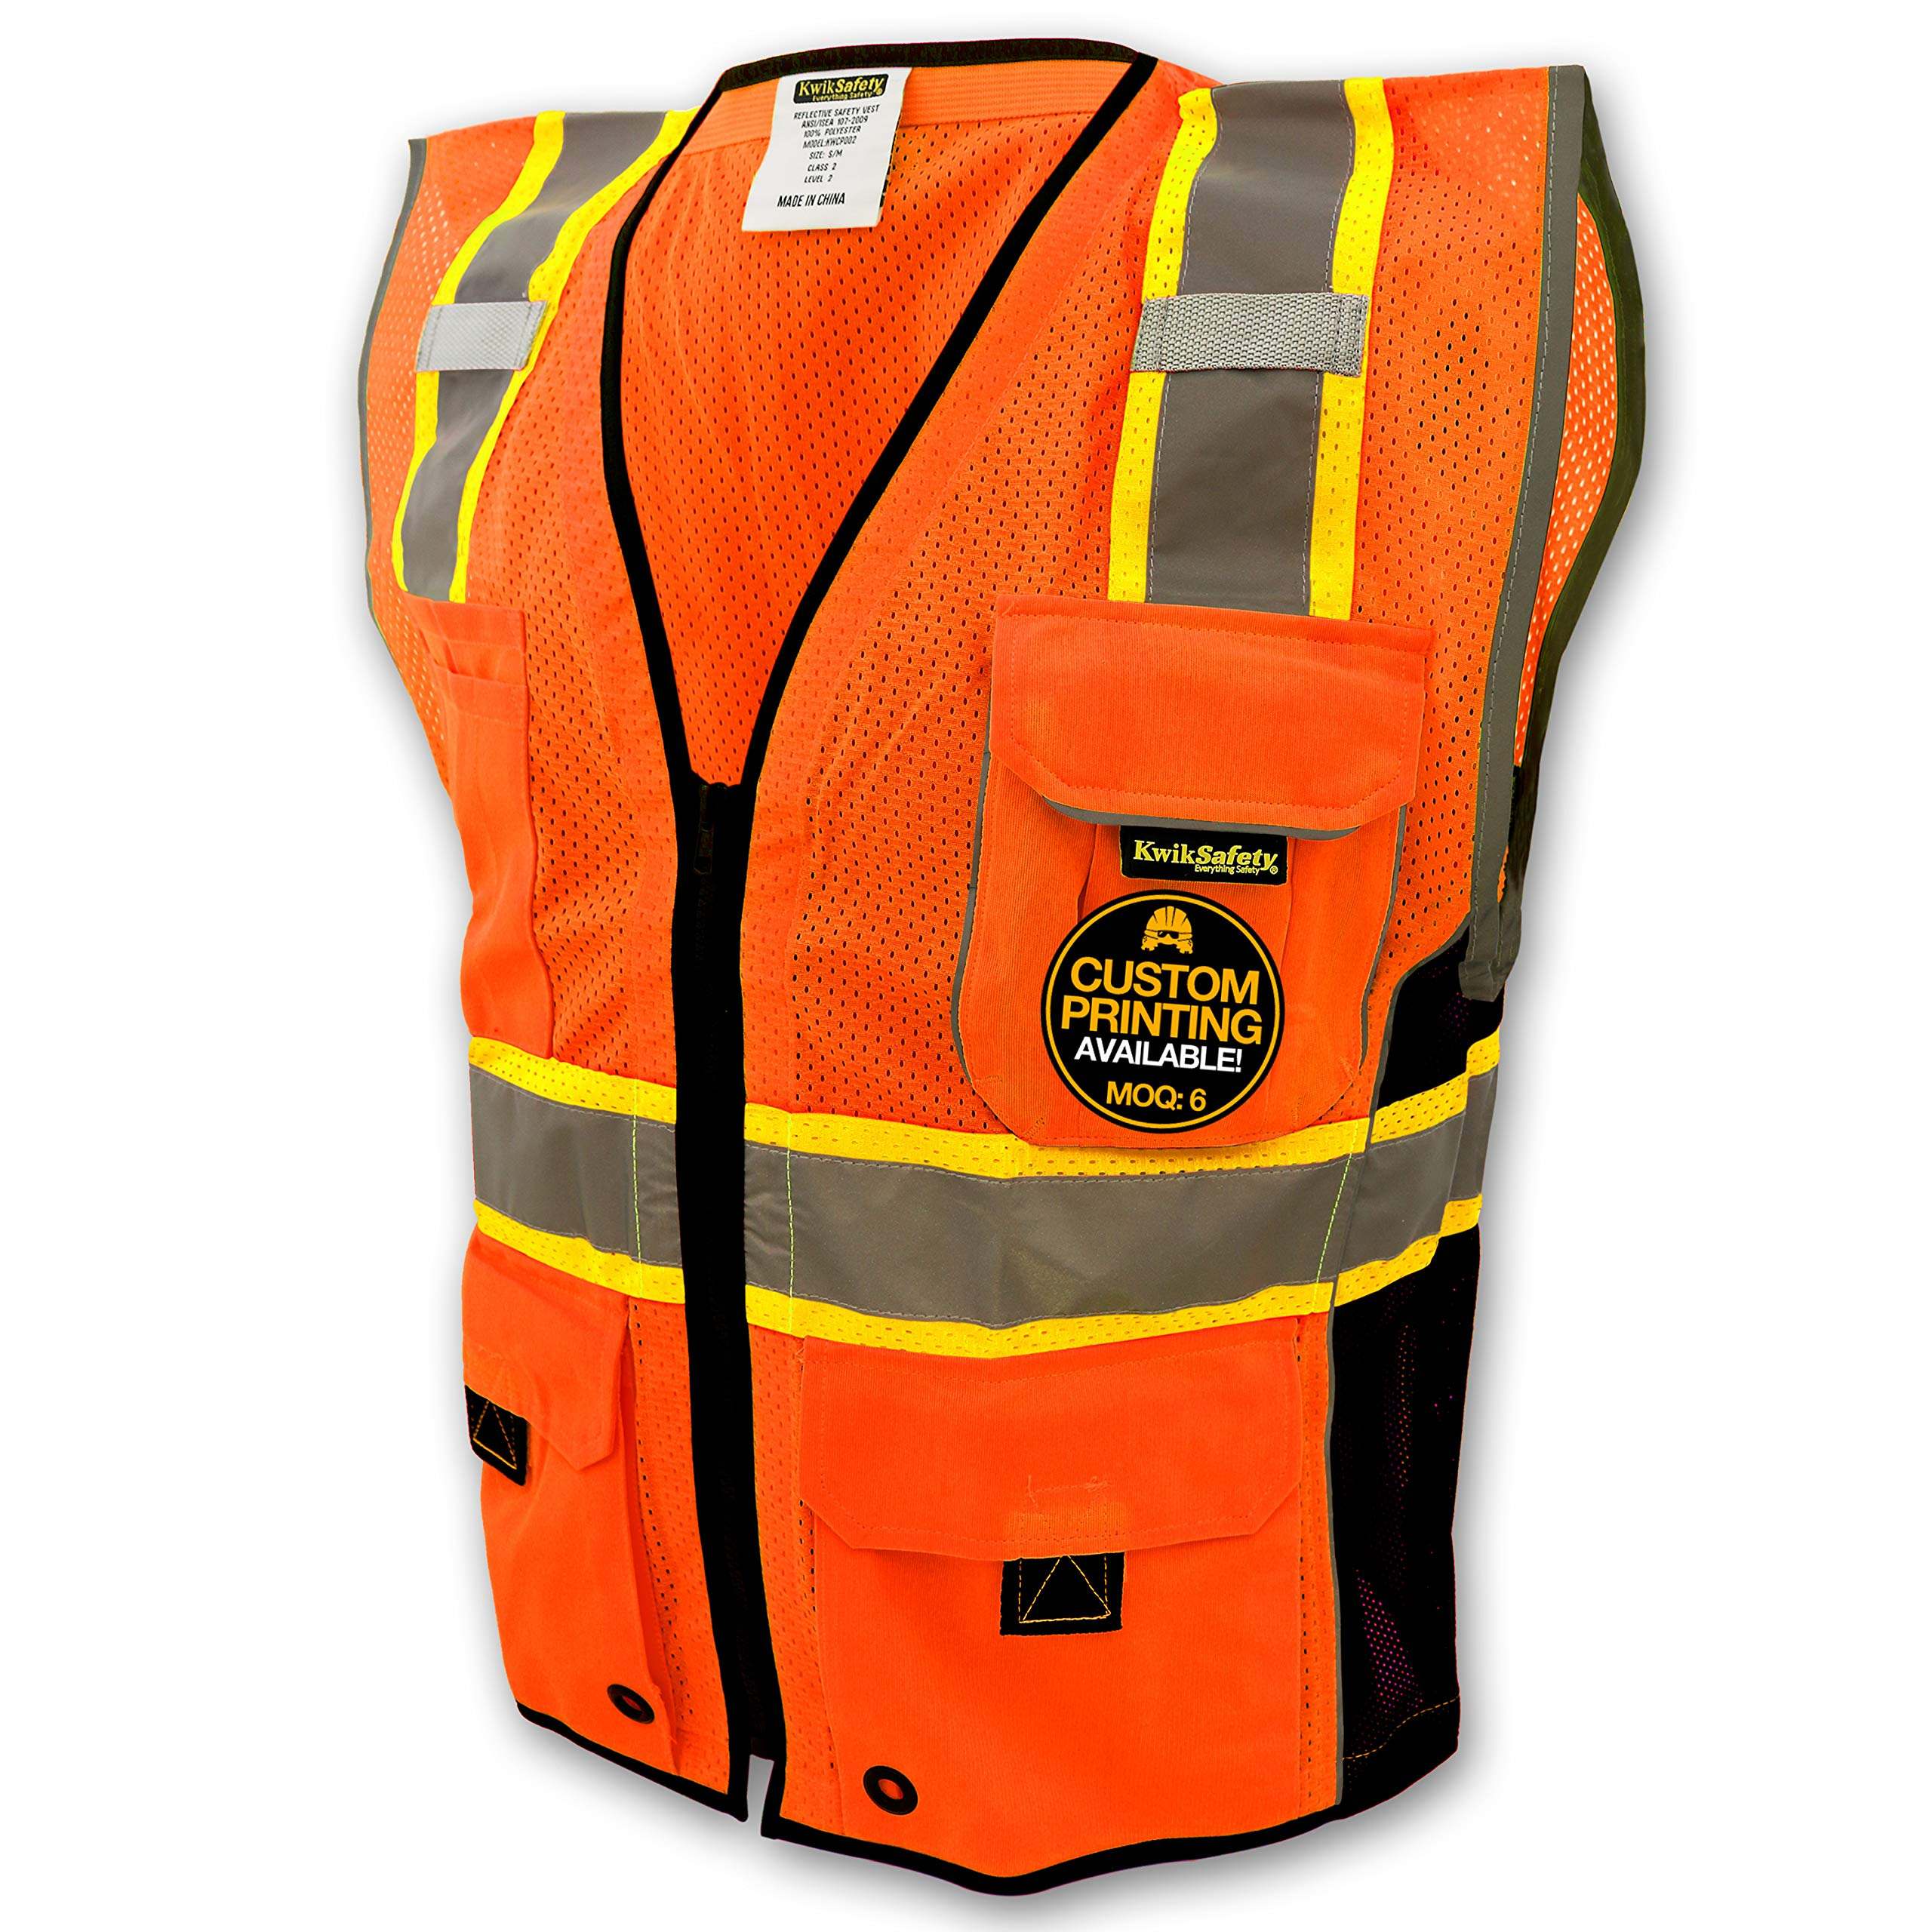 KwikSafety (Charlotte, NC) | CLASSIC Class 2 Safety Vest | ANSI OSHA PPE High Visibility Reflective Stripes Heavy Duty Mesh Pockets and Zipper Hi-Vis Construction Work Hi-Vis Surveyor | Orange Medium